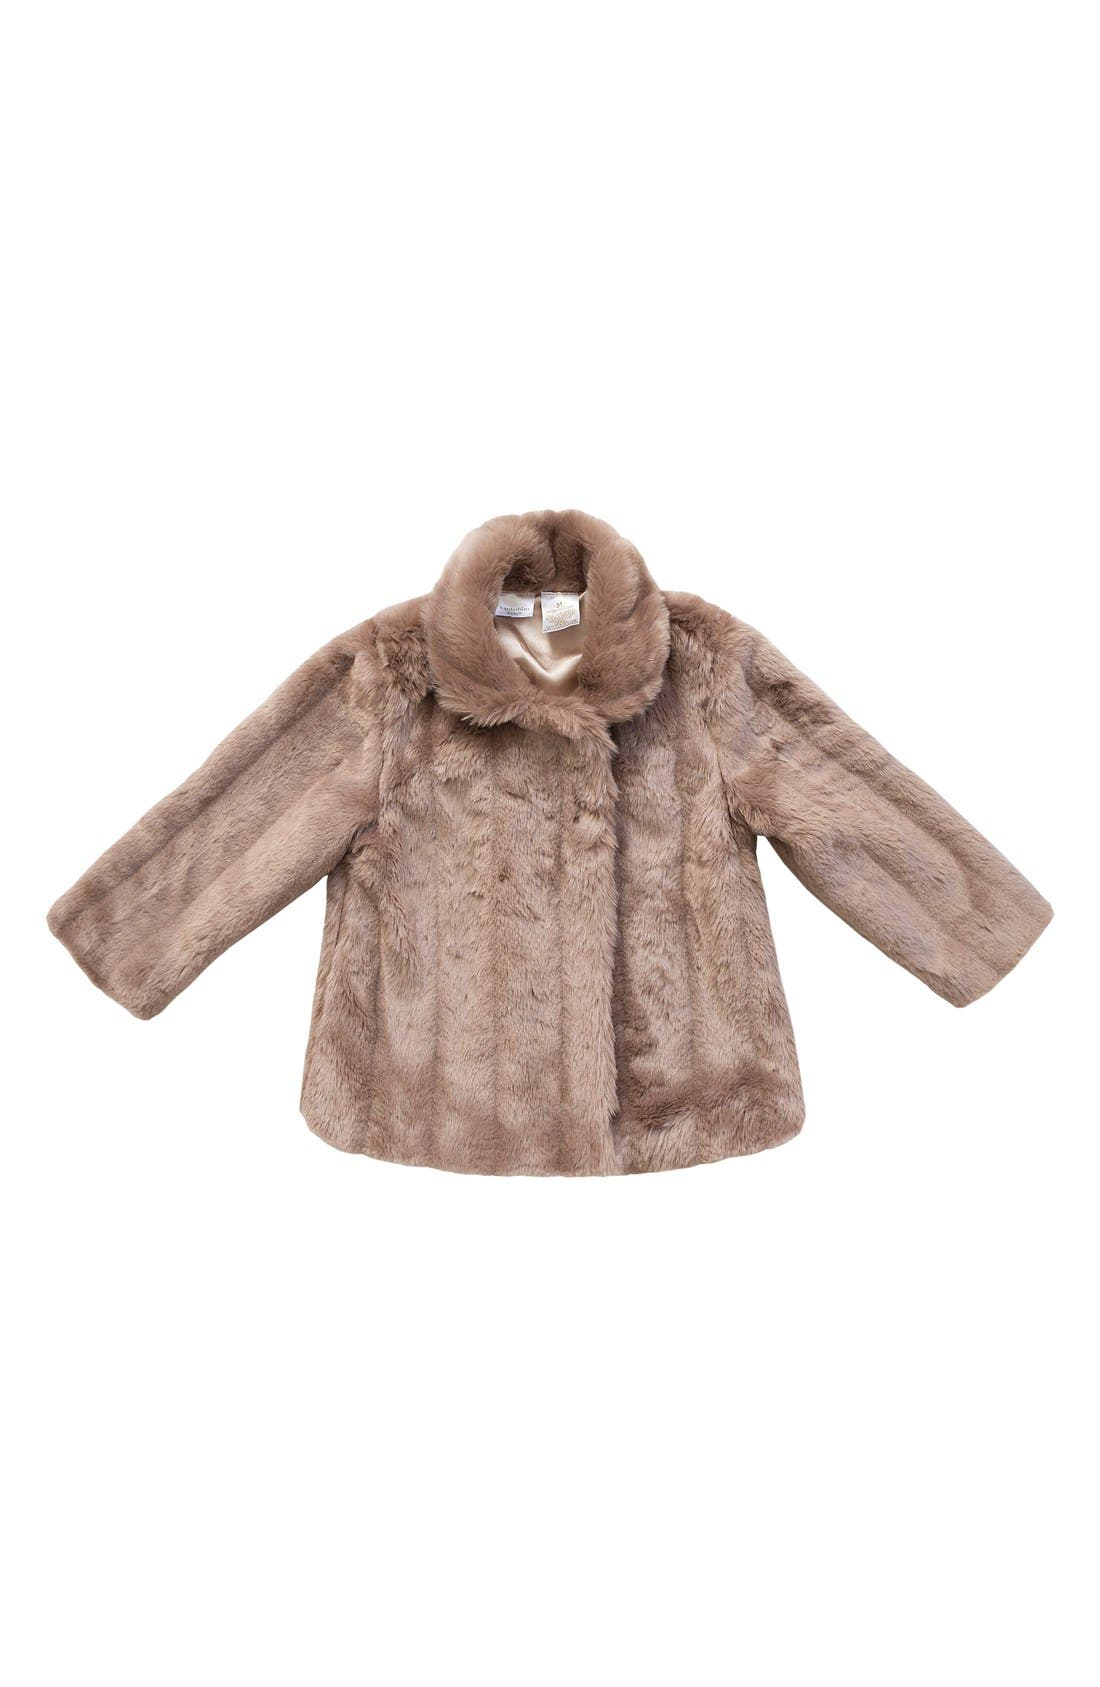 KardashianKids FauxMinkFur Coat, Main, color, 219